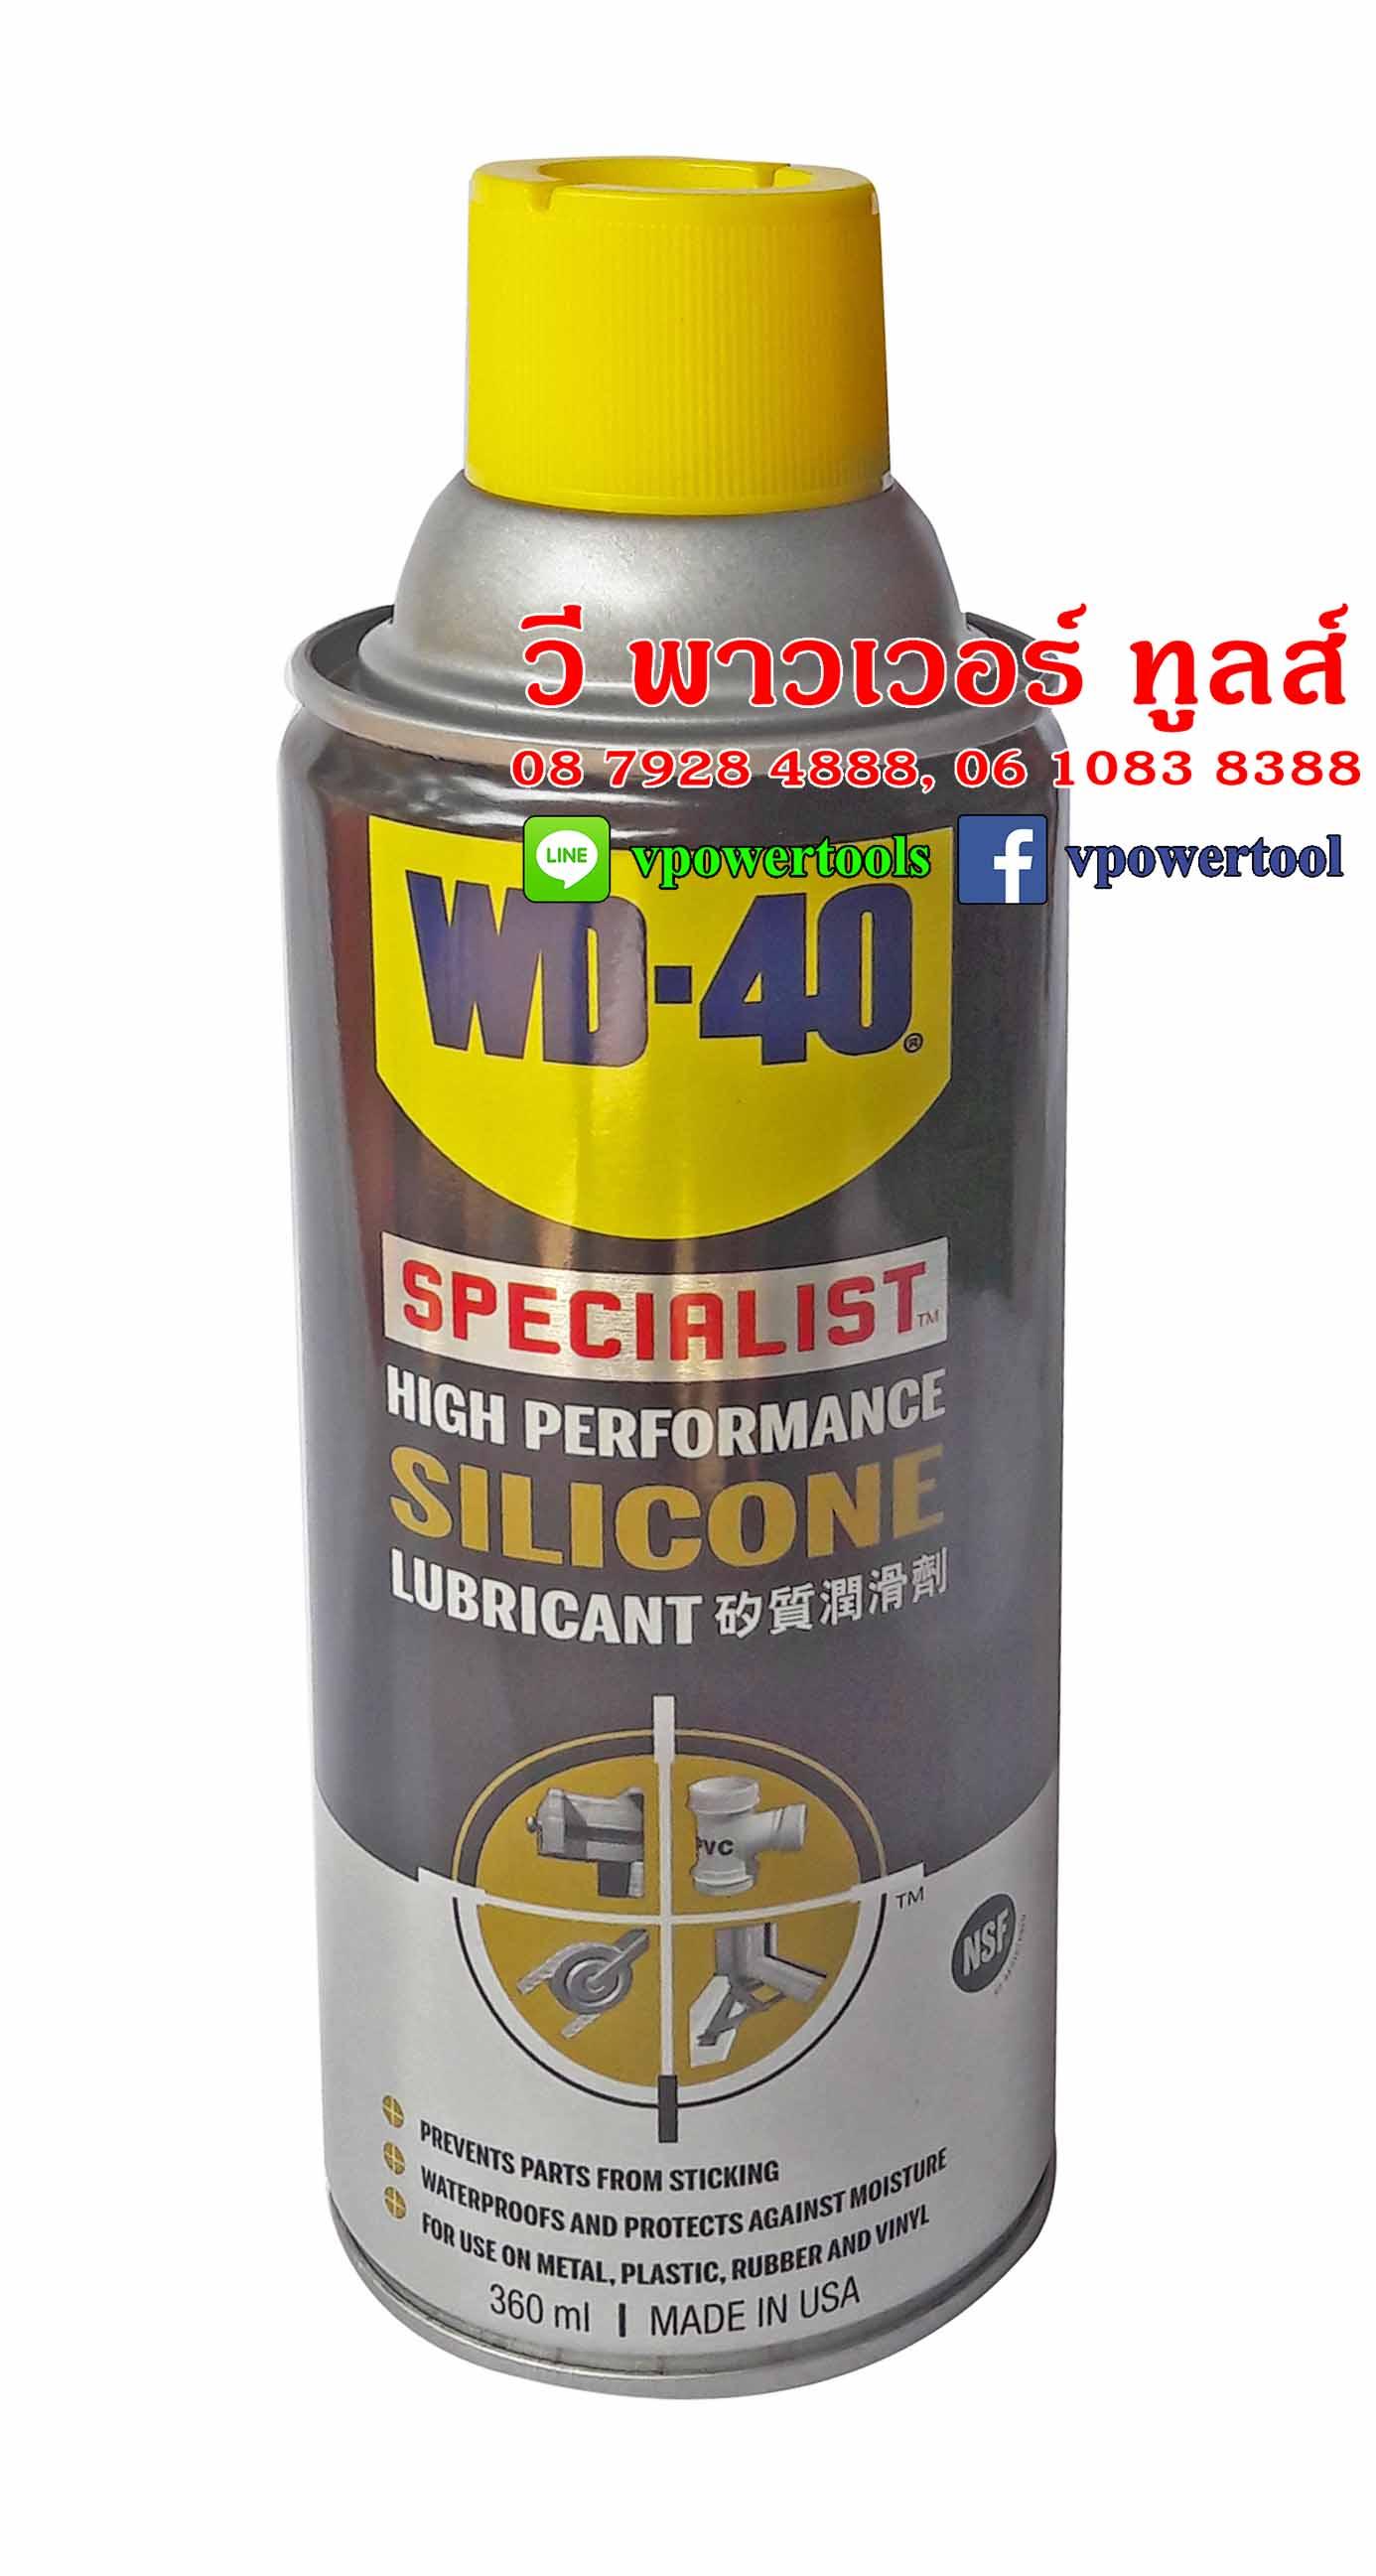 WD-40 SPECIALIST SILICONE LUBRICANT SPRAY ซิลิโคน สเปรย์ 360มล.